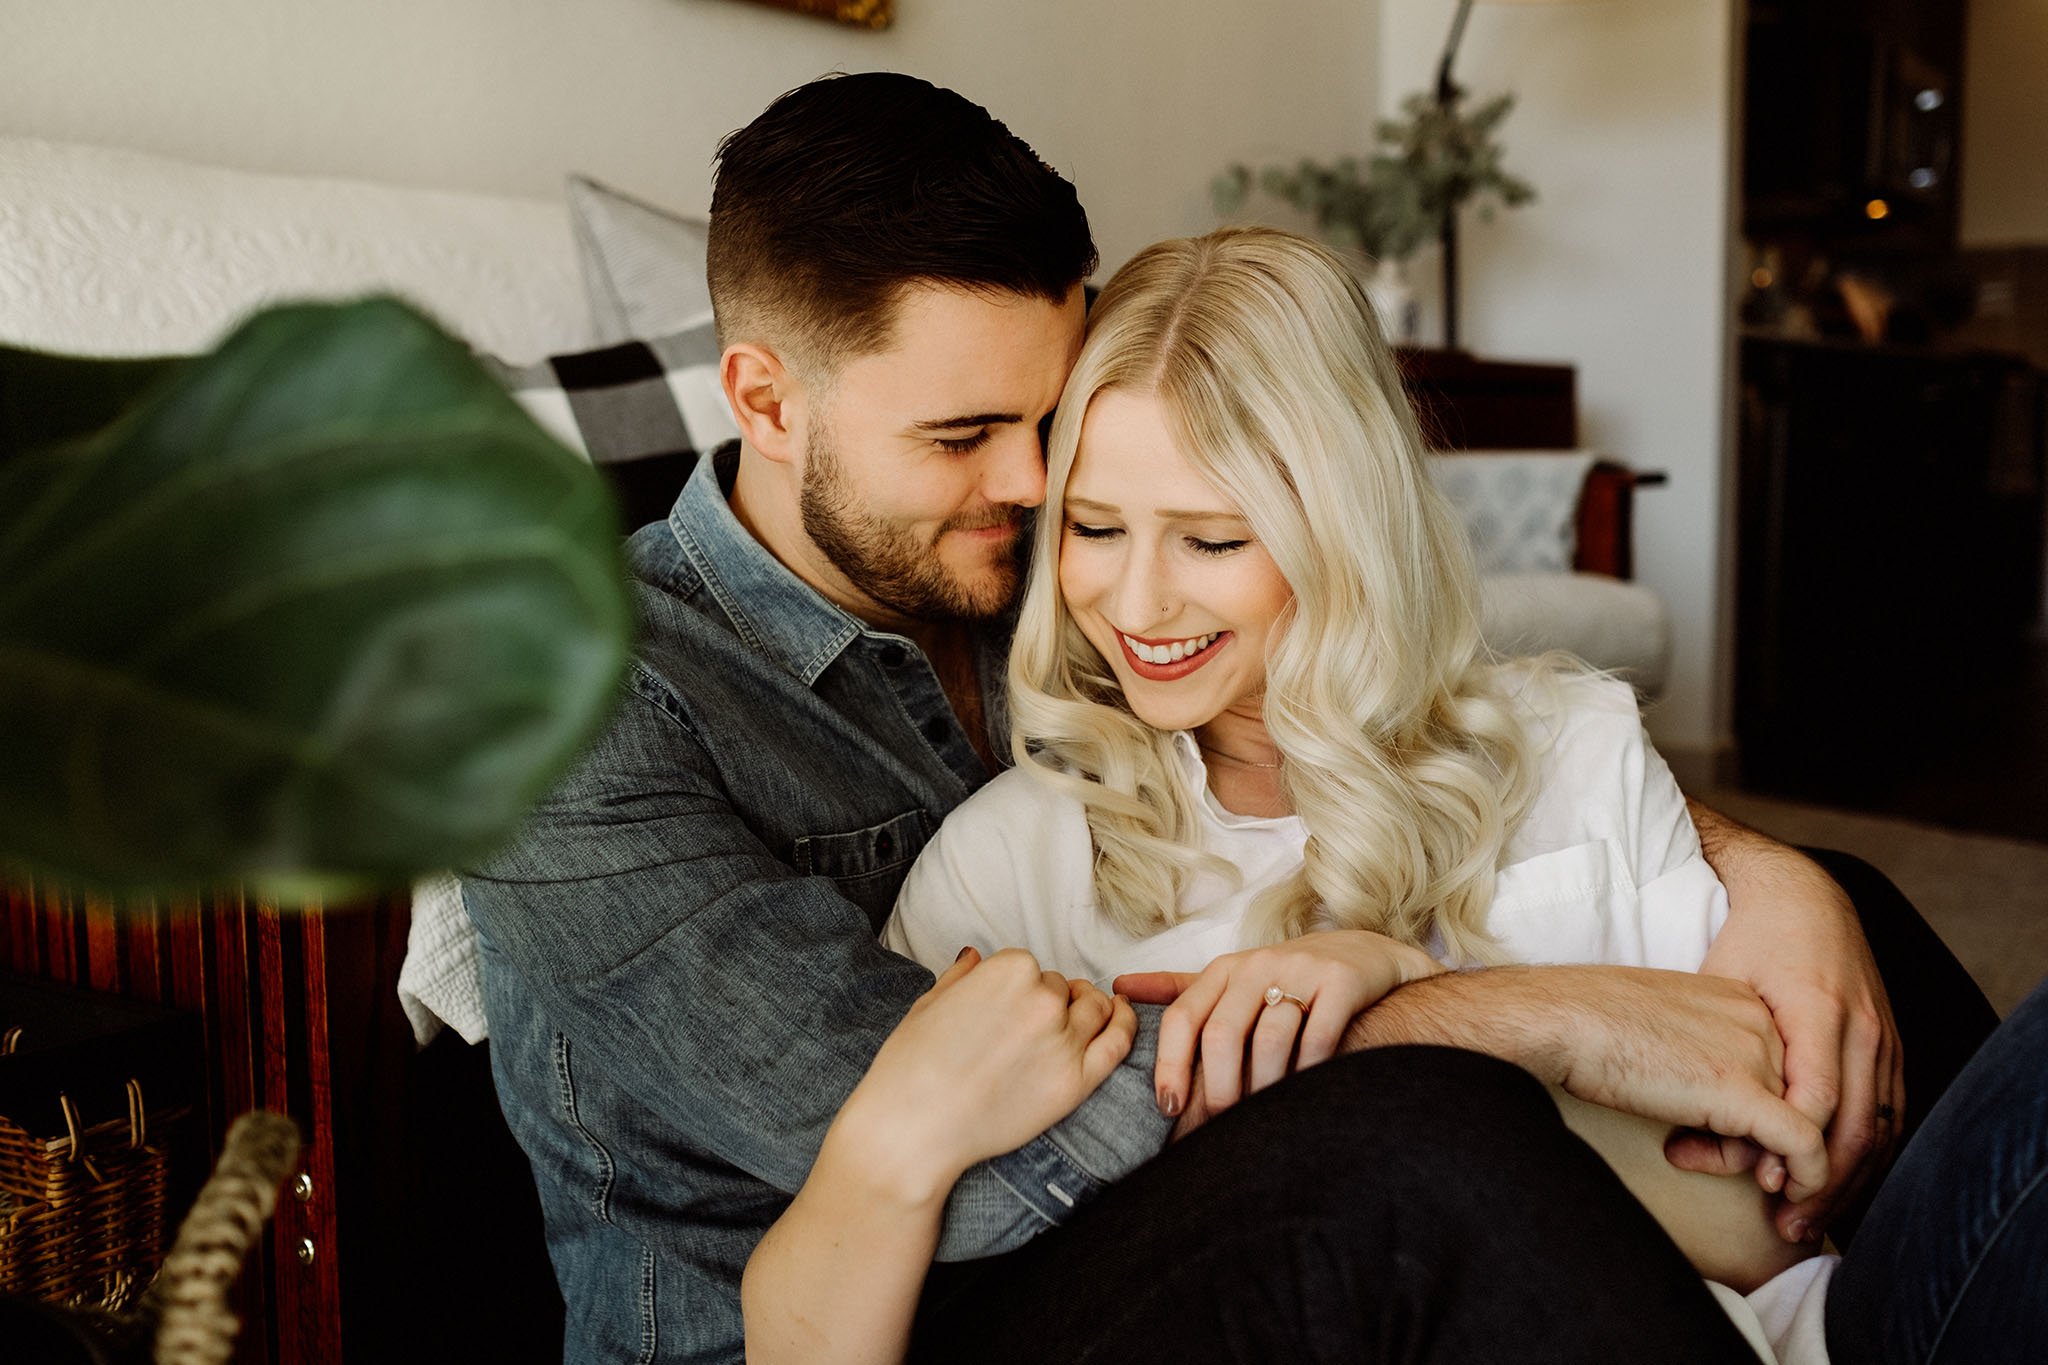 Arizona-in-home-session-wedding-photographer (20).jpg